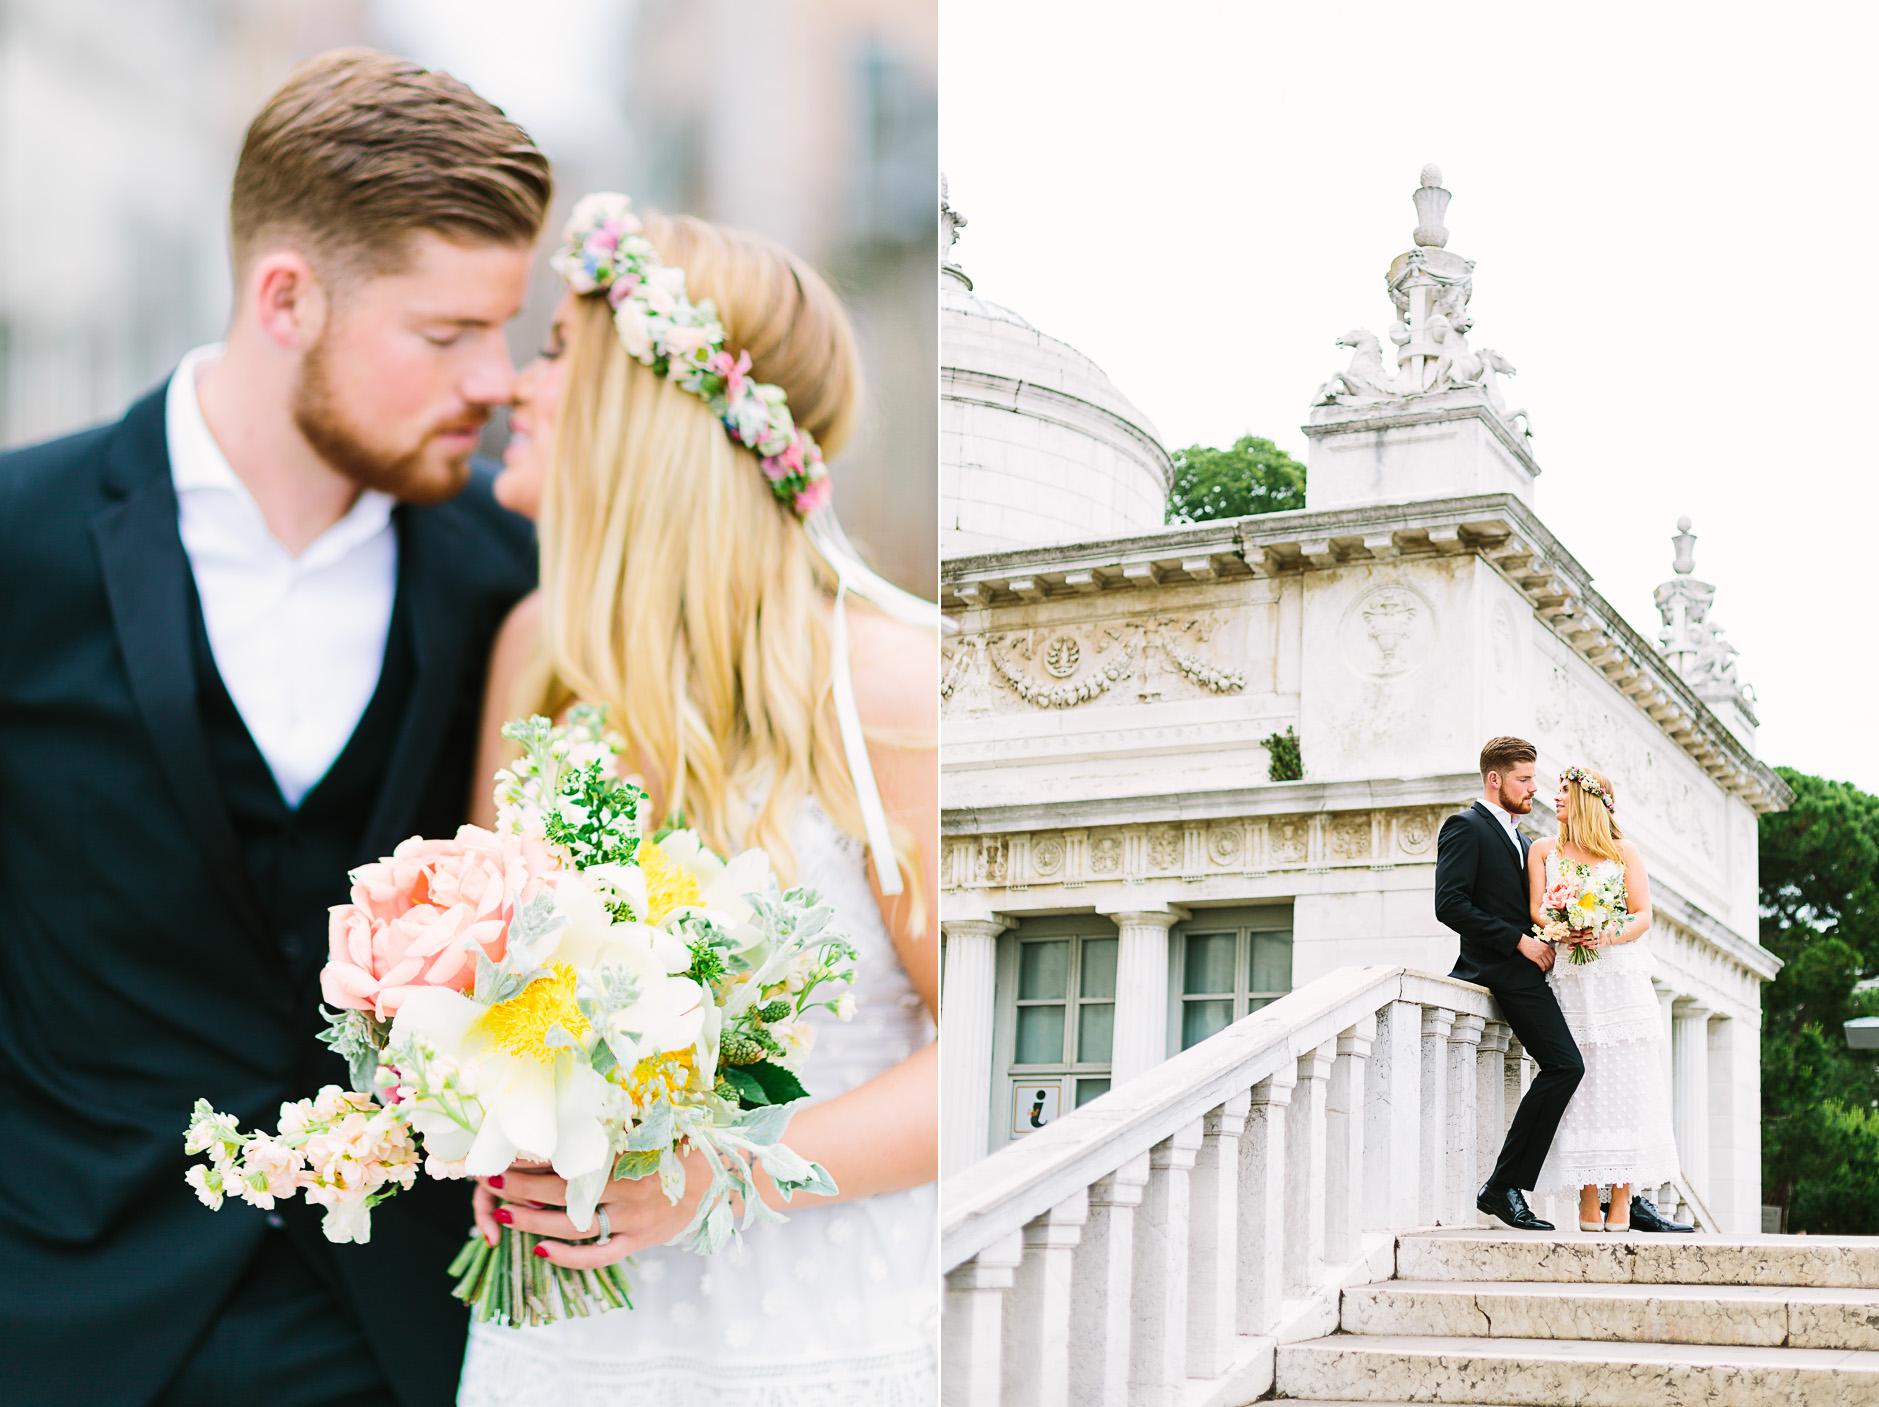 Hochzeitsfotograf Le Hai Linh Boho Chic After Wedding Shooting Venedig Timo Horn 1.FC Koeln 043.jpg